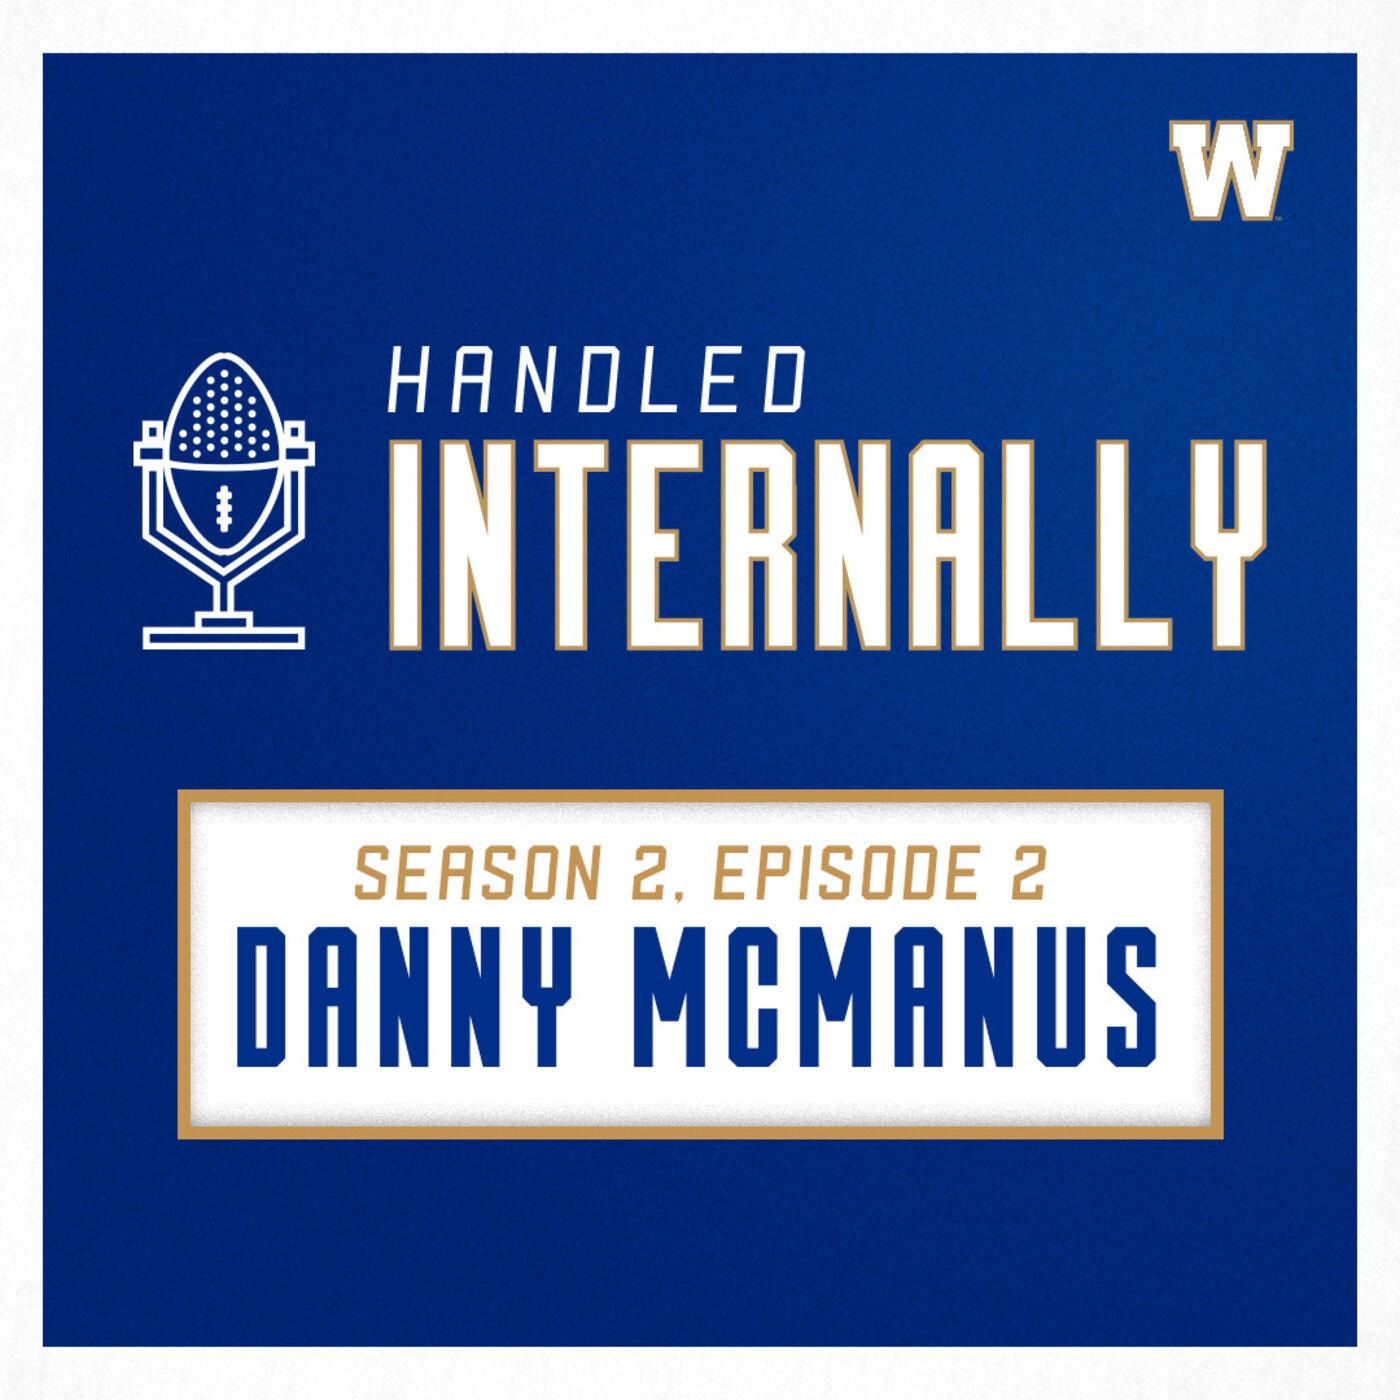 Season 2, Episode 2 - Danny McManus